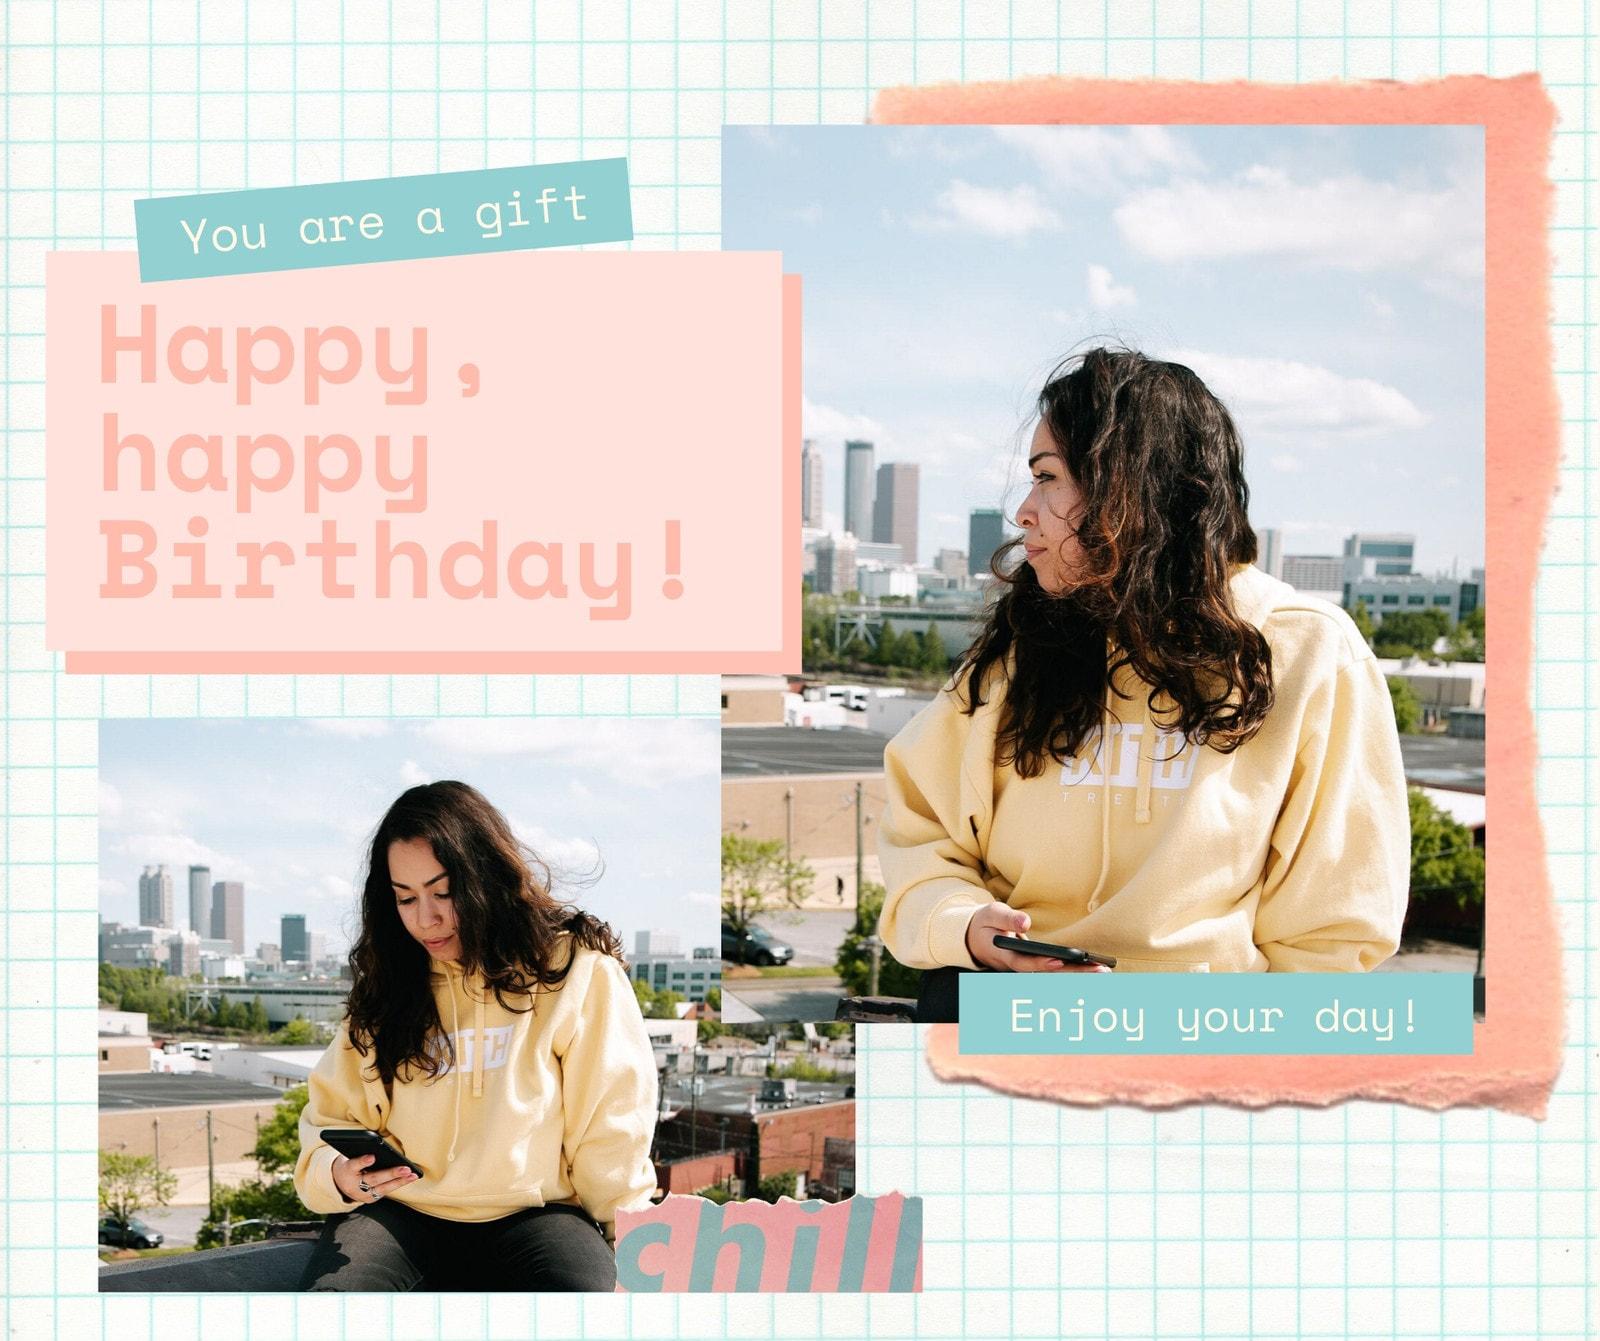 Pink and Teal Photo Modern Scrapbook General Greeting Birthday Facebook Post